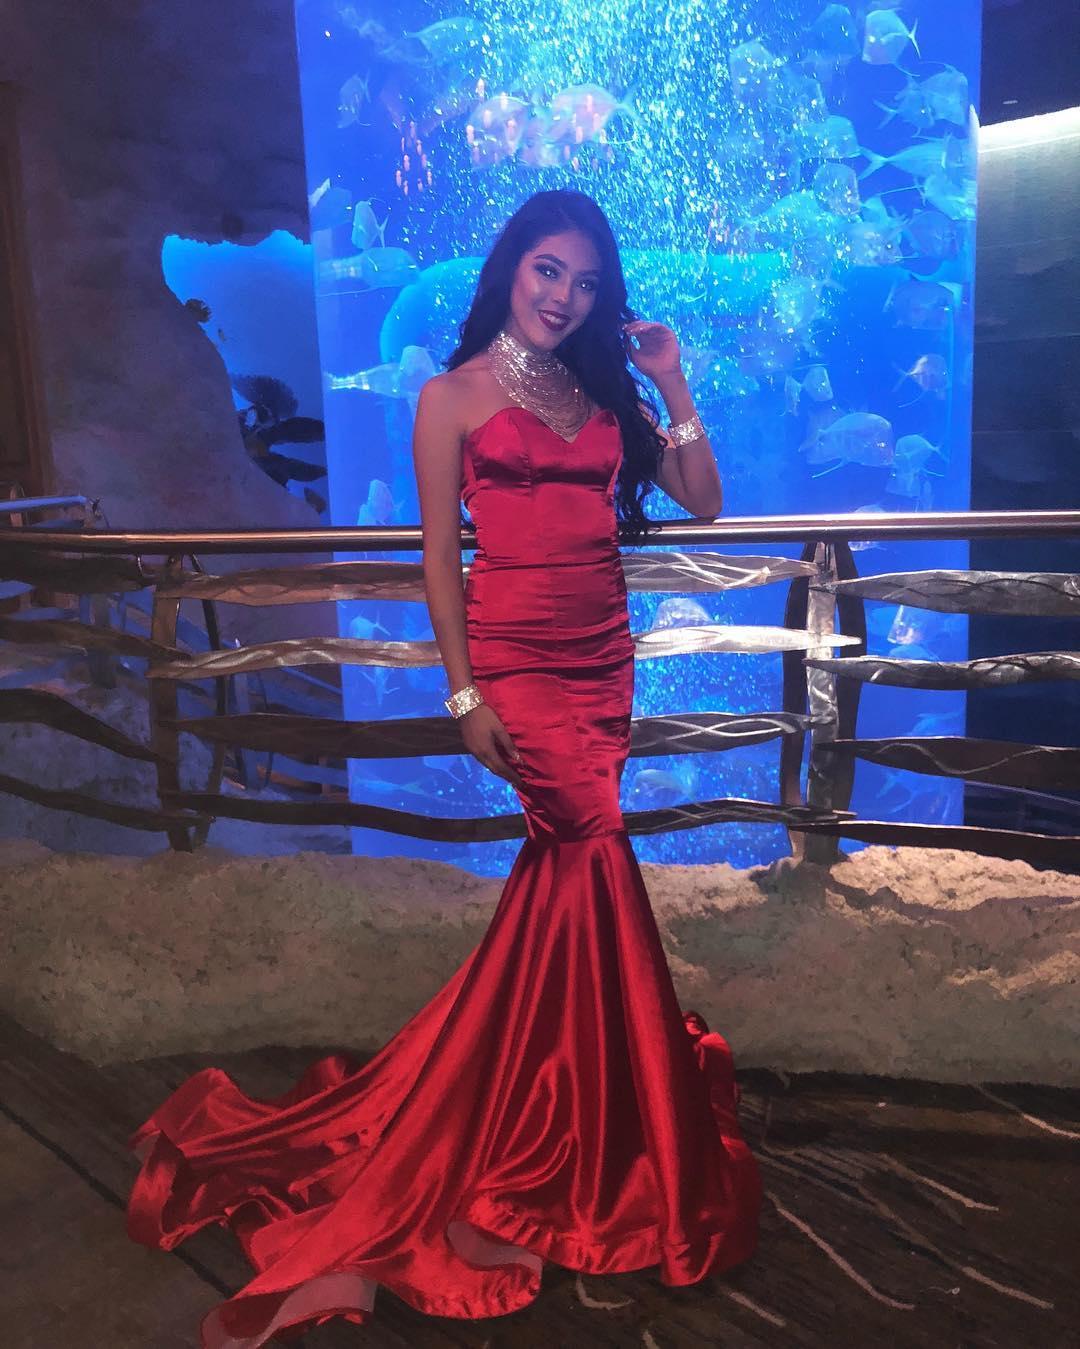 kristian de leon, miss teen mundial usa 2019/top 16 de teen universe 2018. - Página 3 33992110